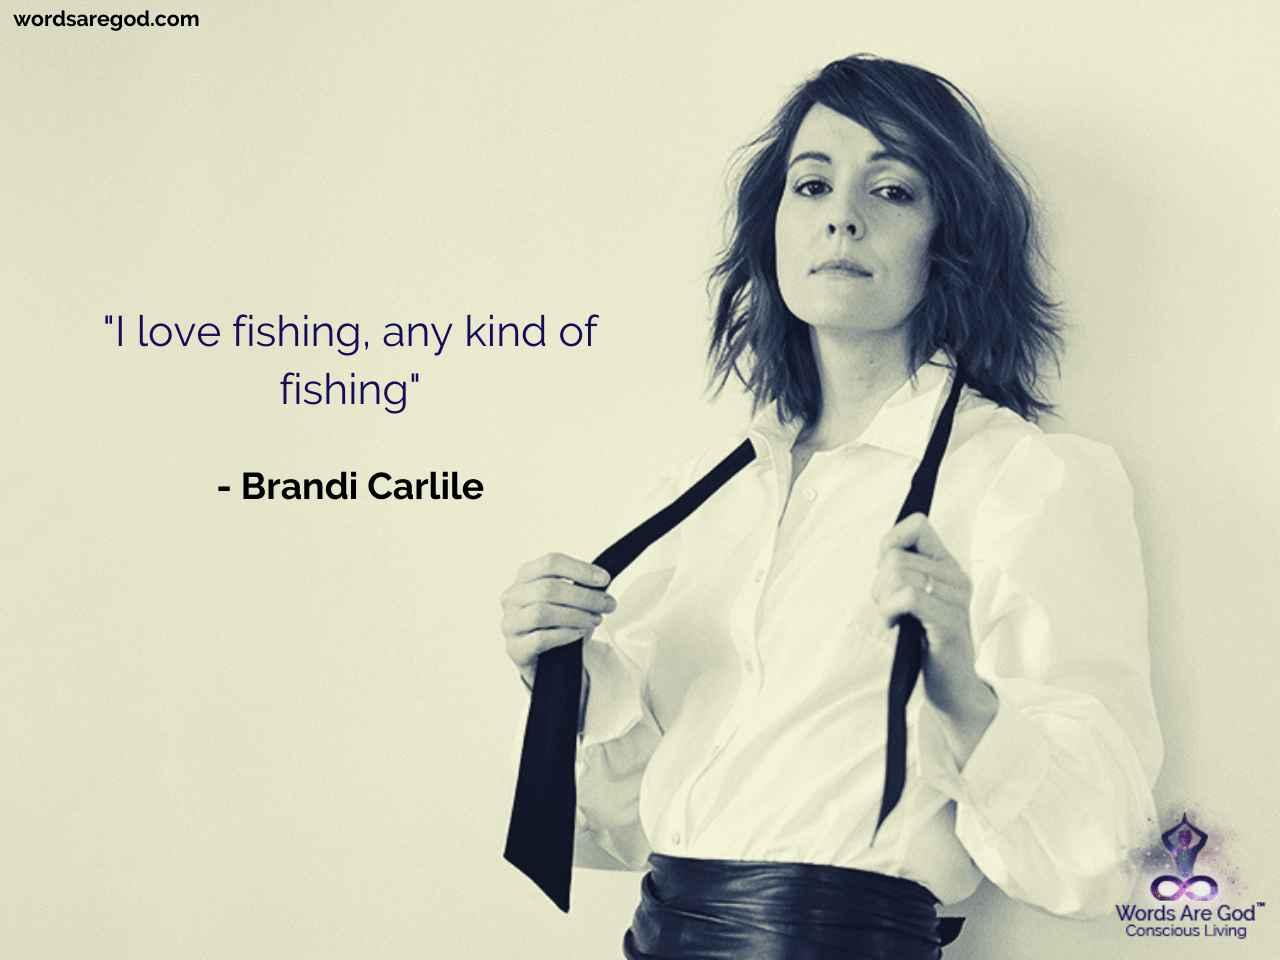 Brandi Carlile Motivational Quotes